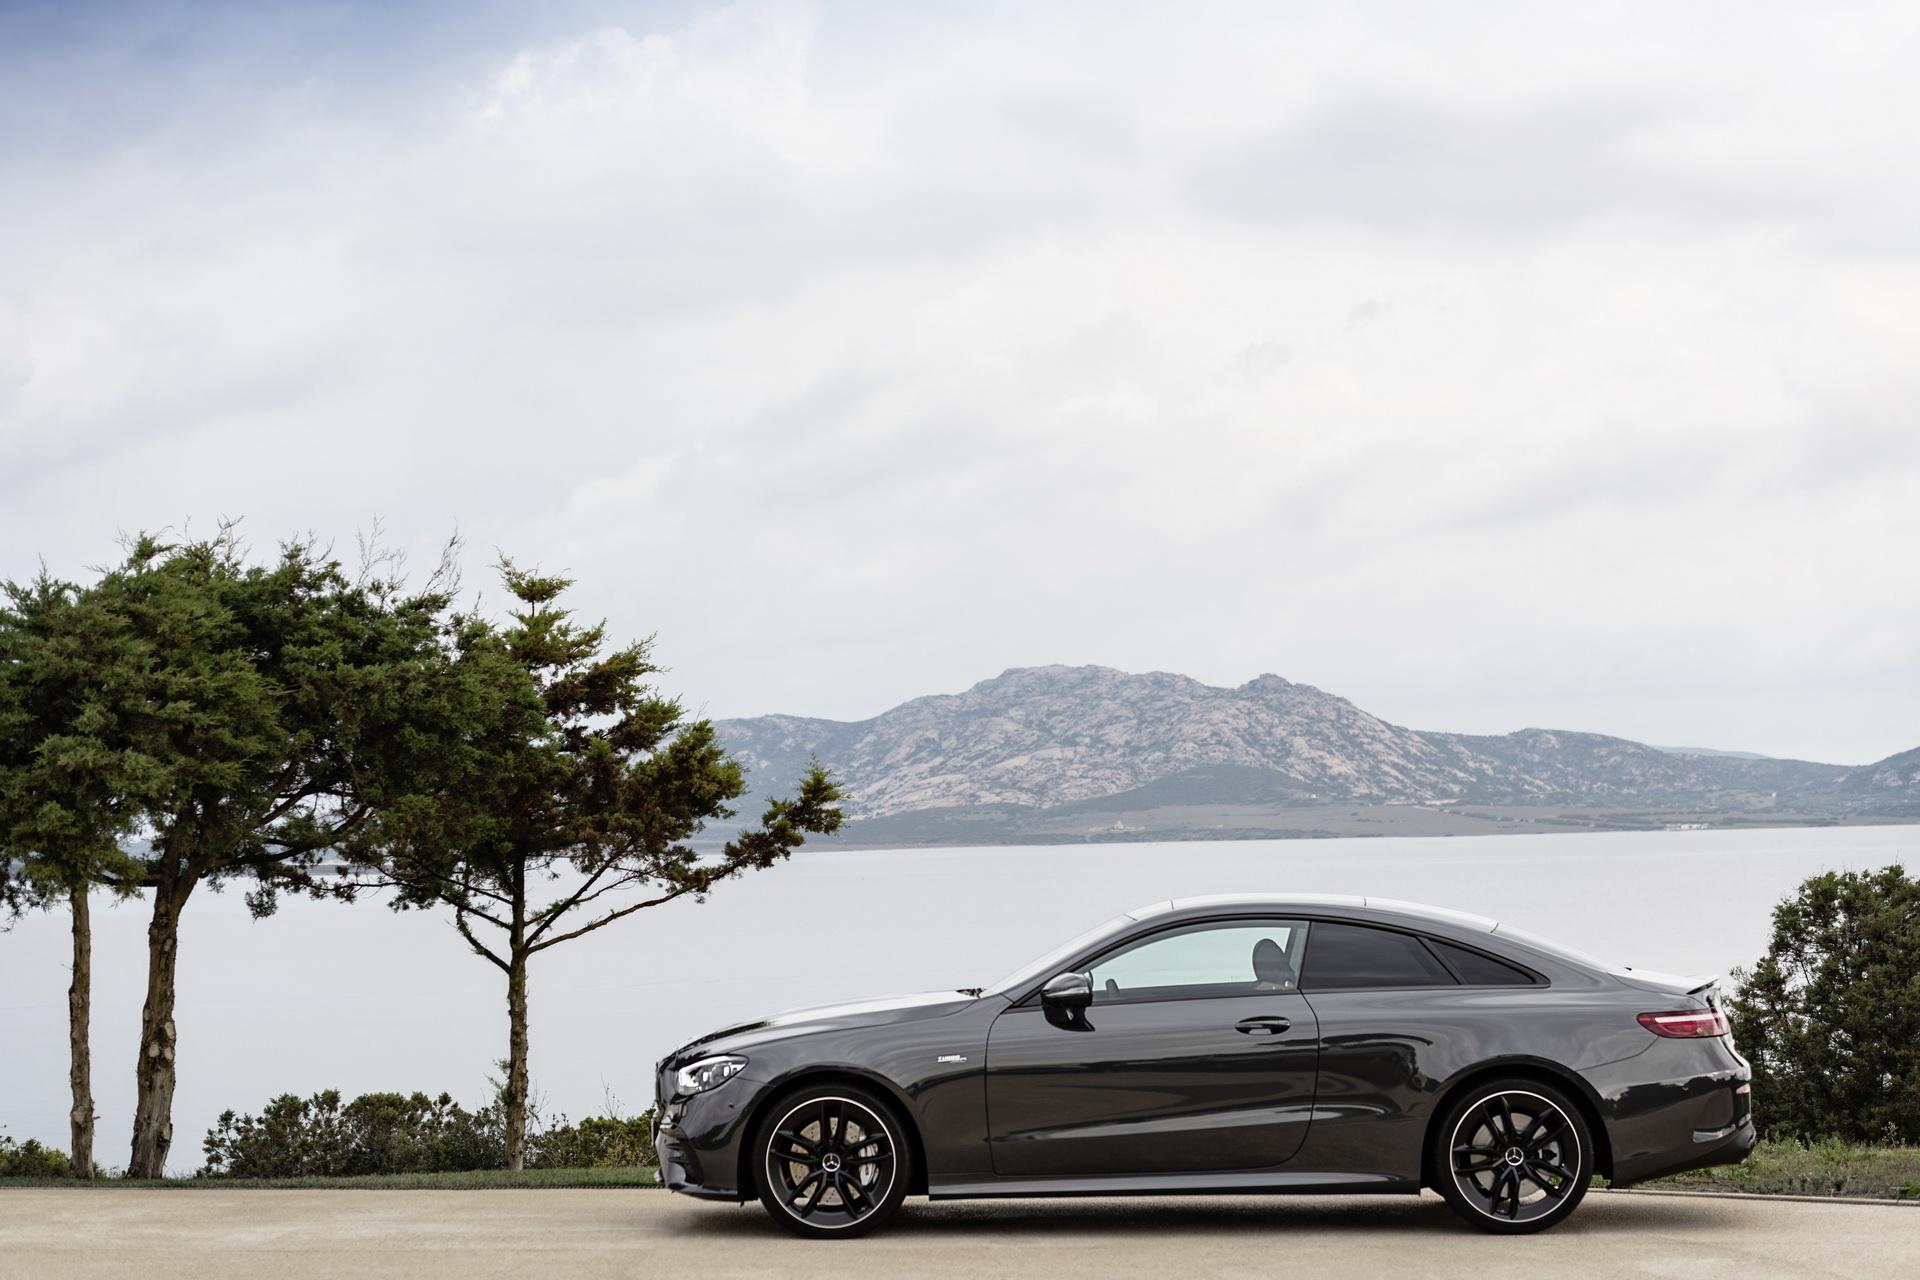 Nuoae Mercedes-AMG E 53 Coupé